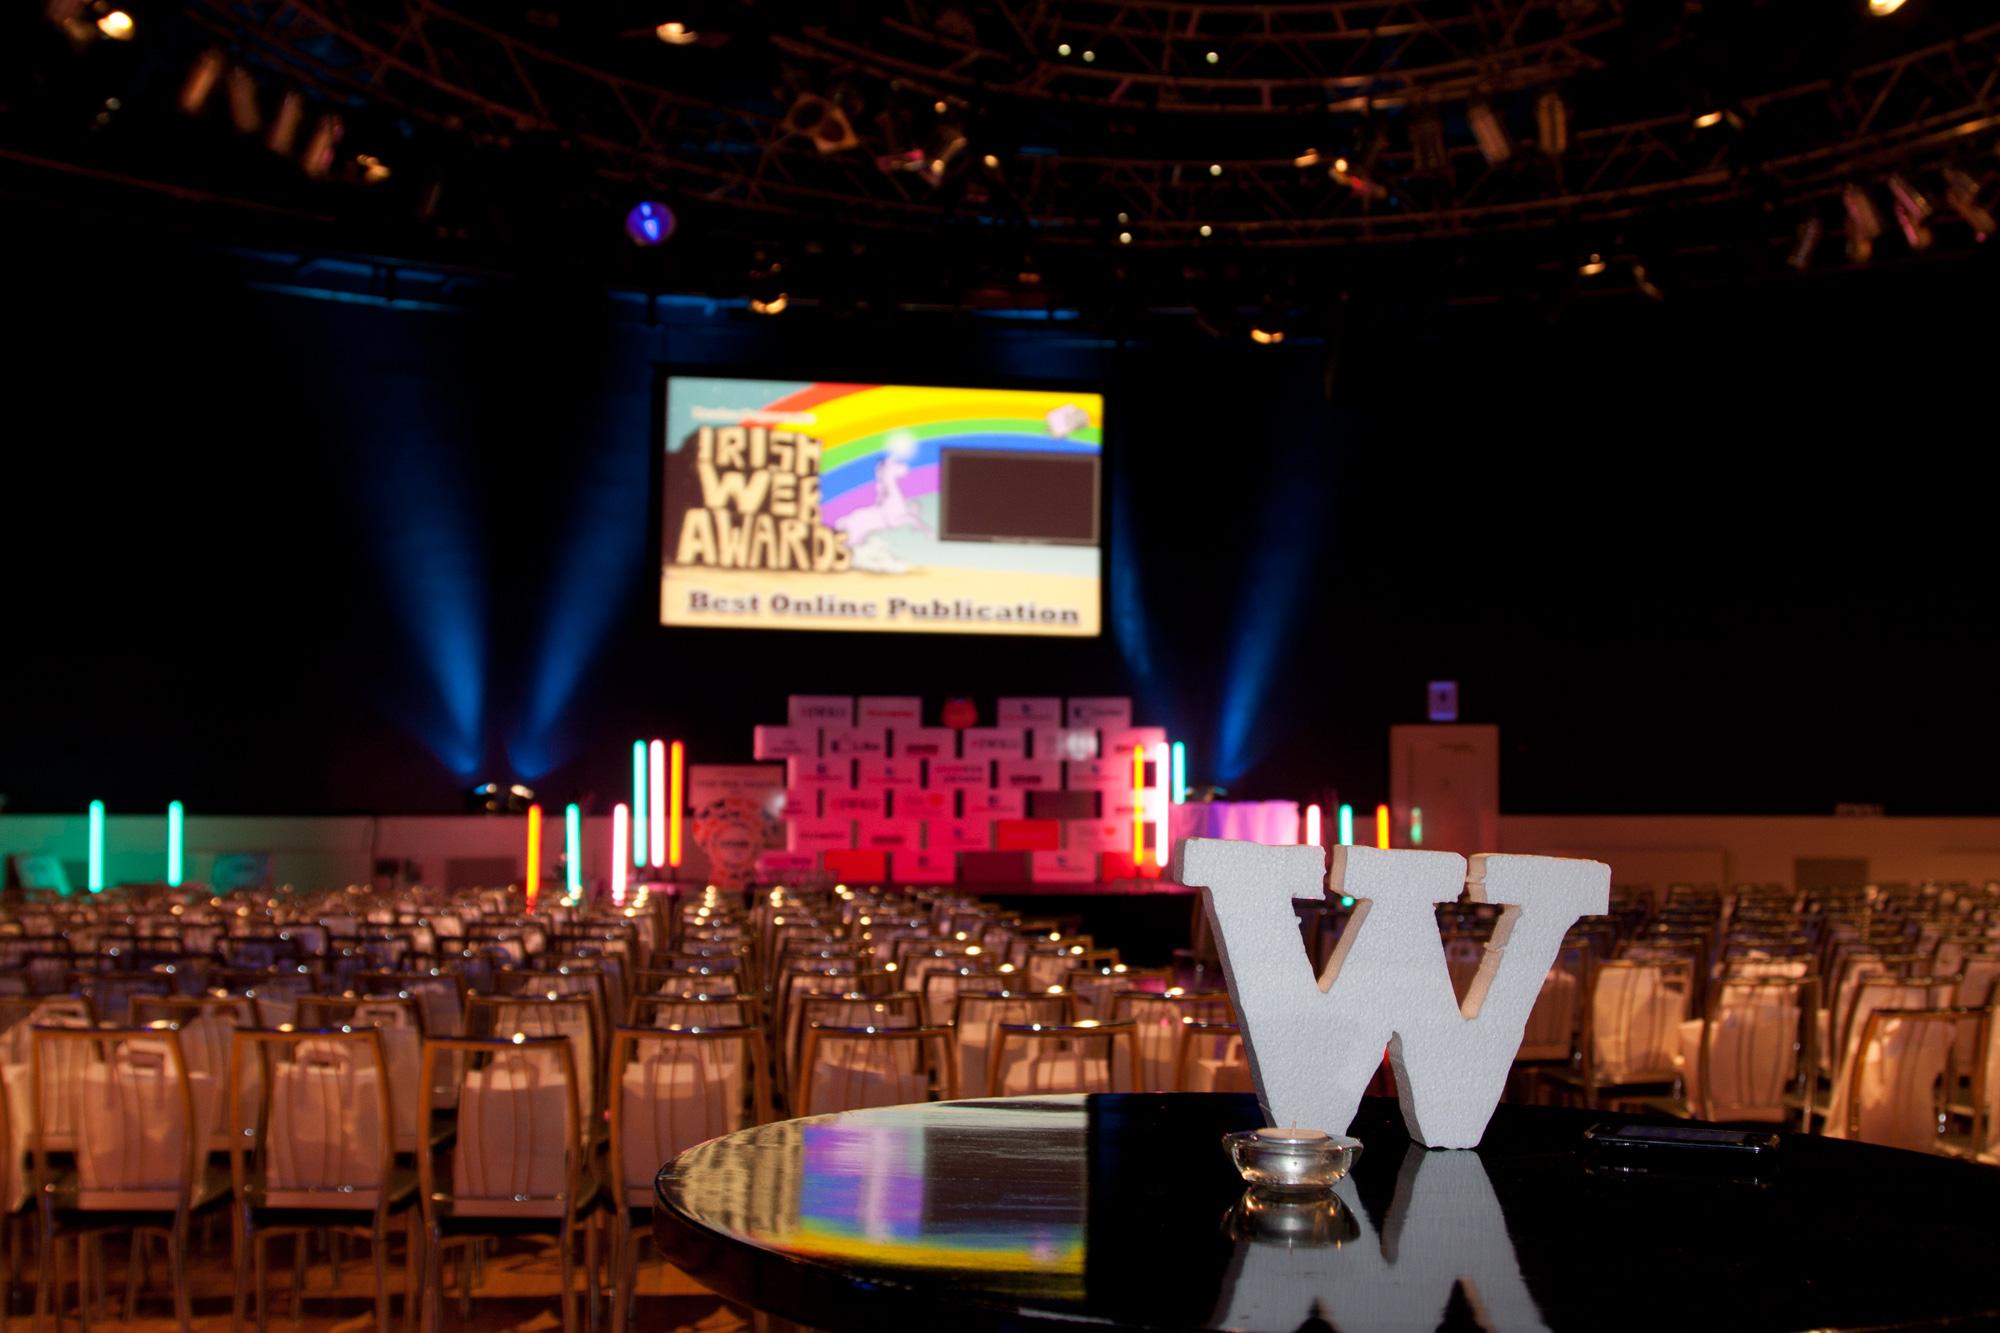 Irish Web Awards 2012 winners